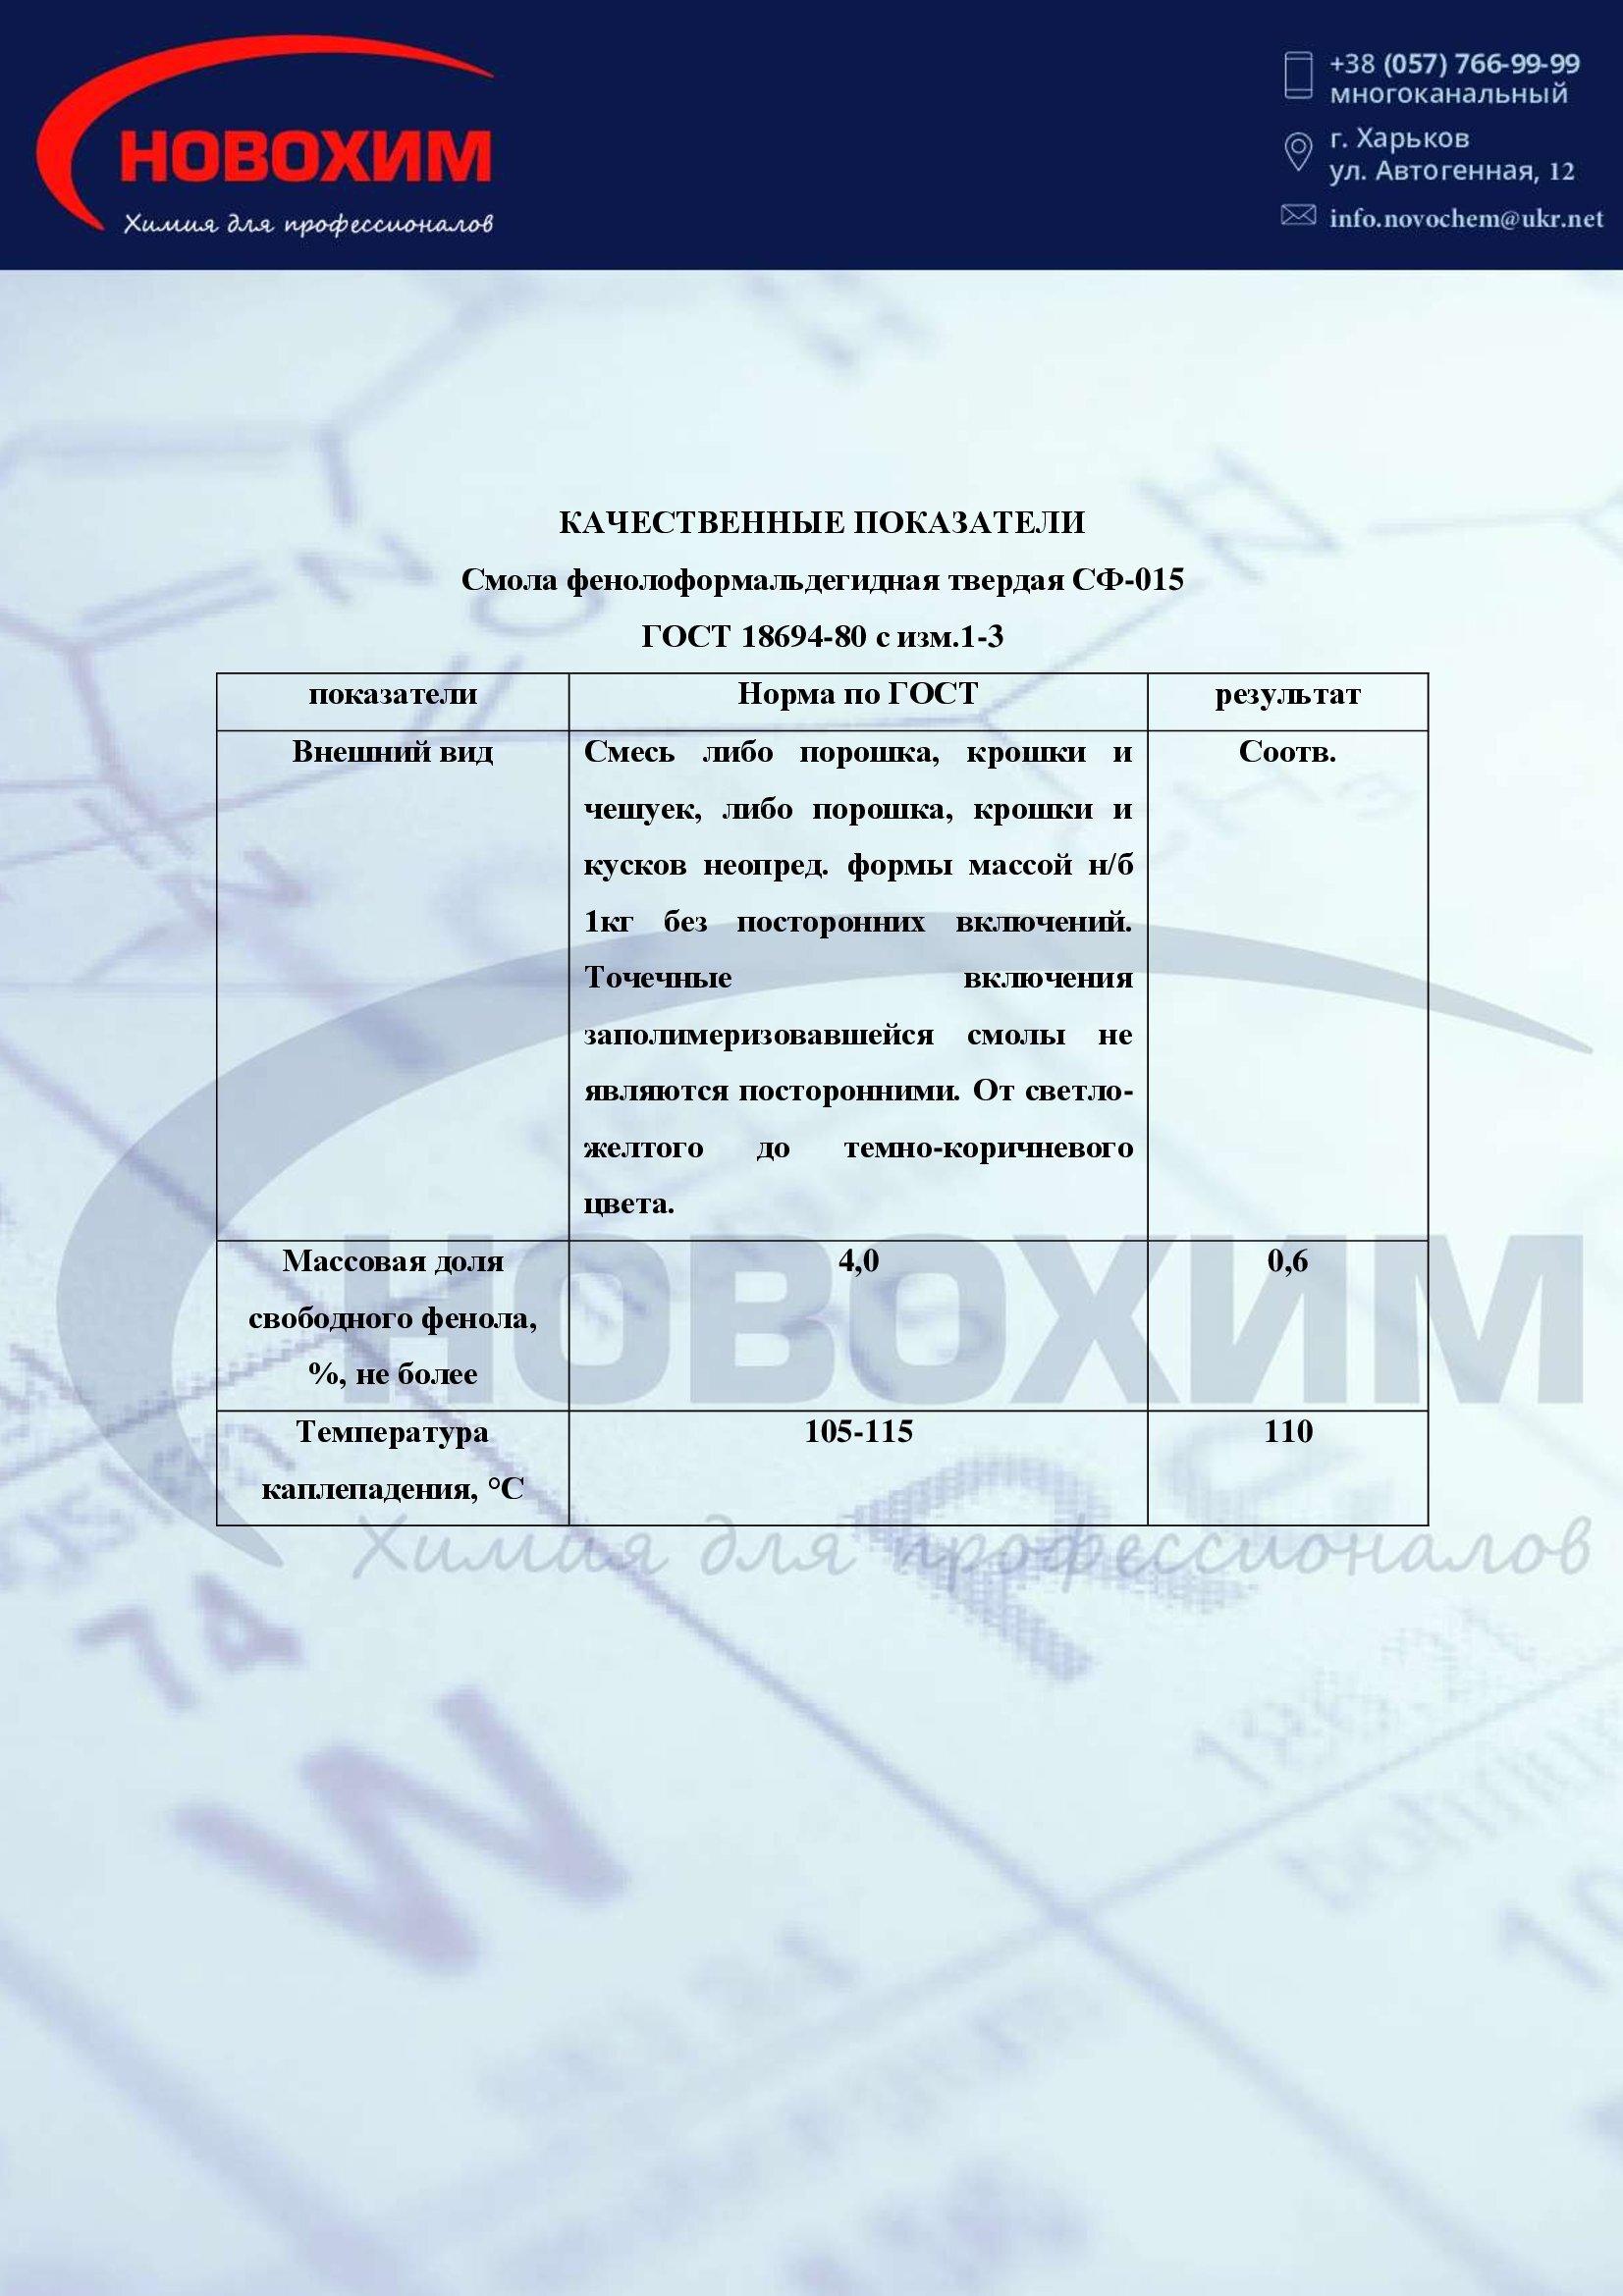 Фото сертификат смола СФ